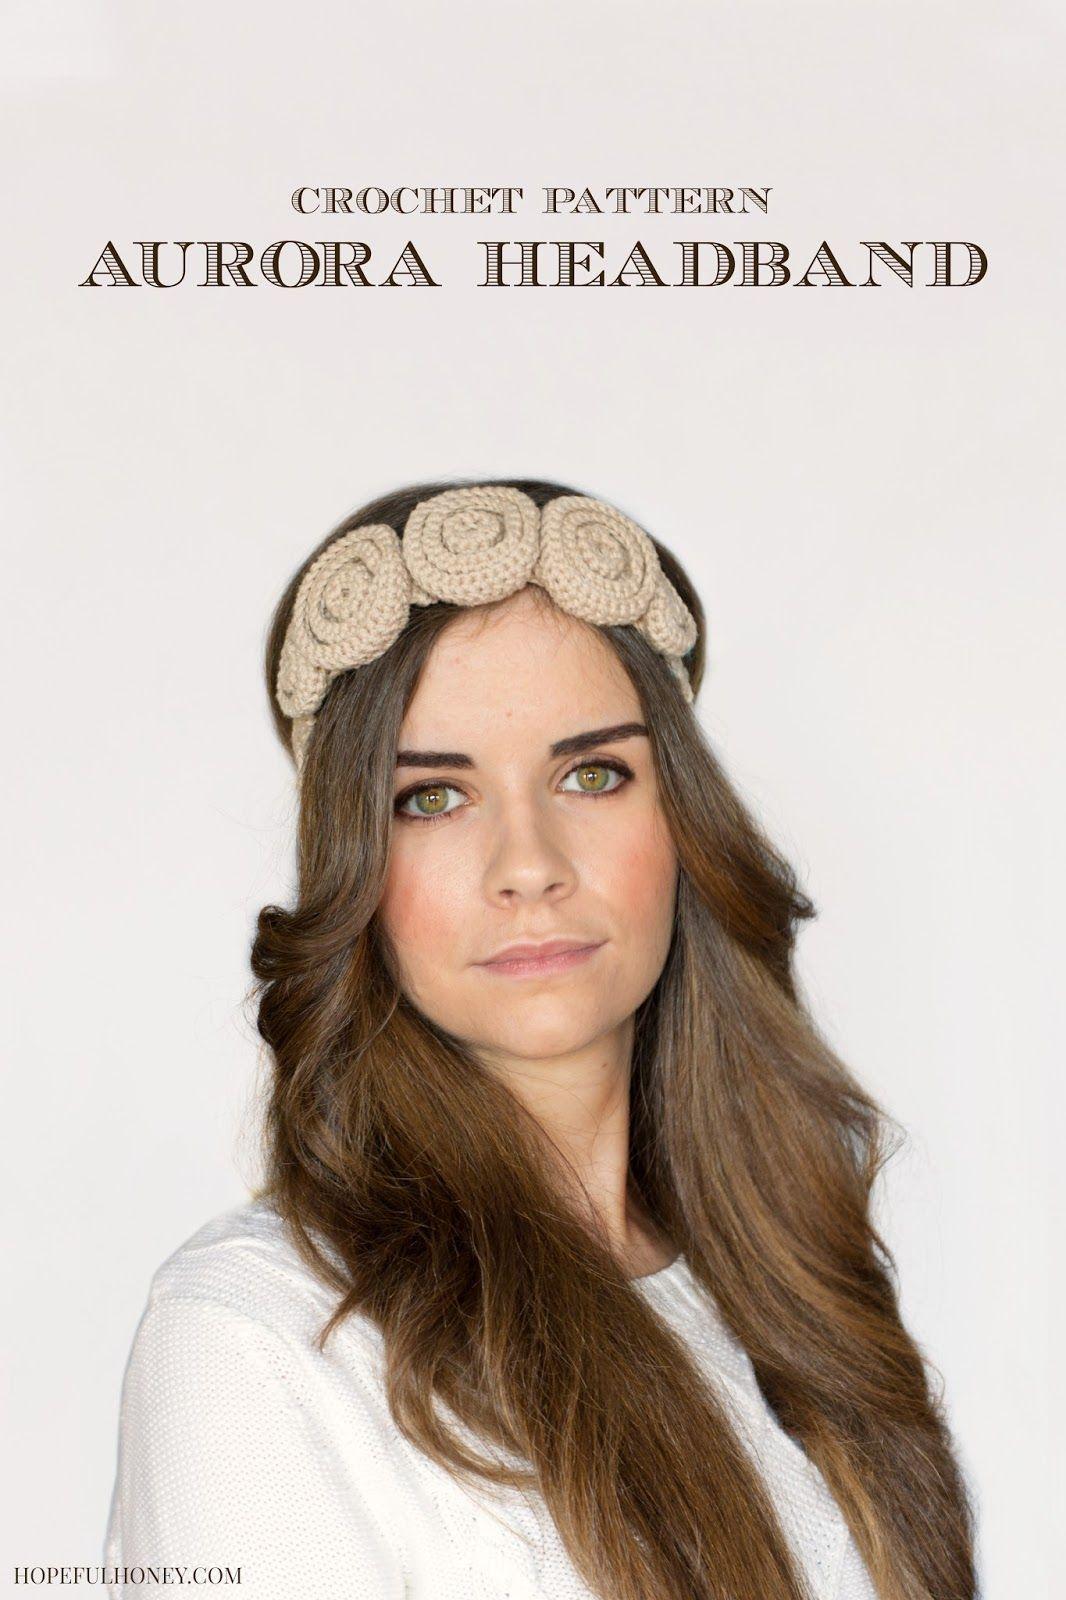 Aurora Headband Crochet Pattern   head band crochet   Pinterest ...